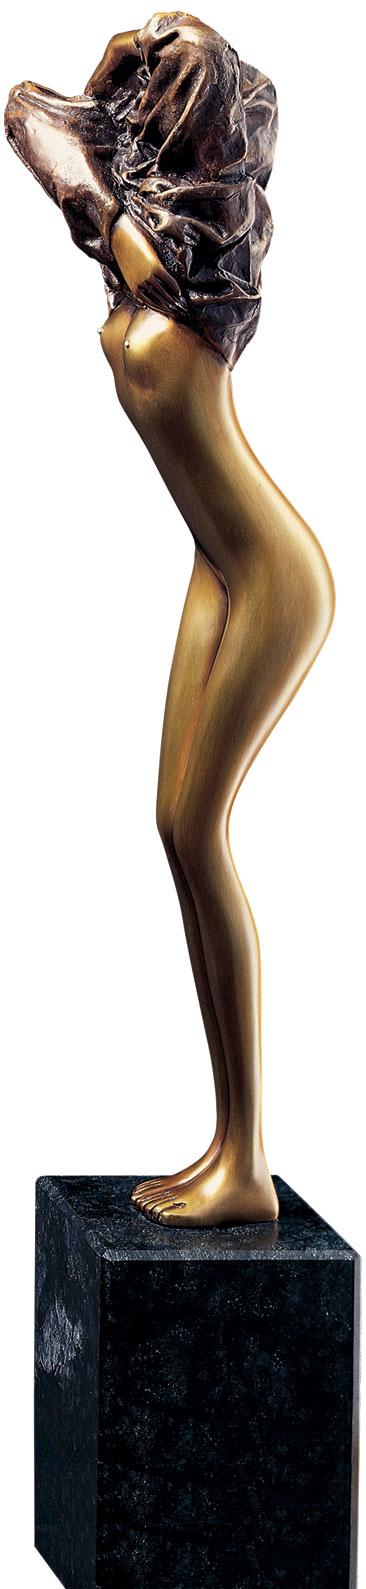 "Skulptur ""Venere assoluta"", Bronze auf Steinsockel"